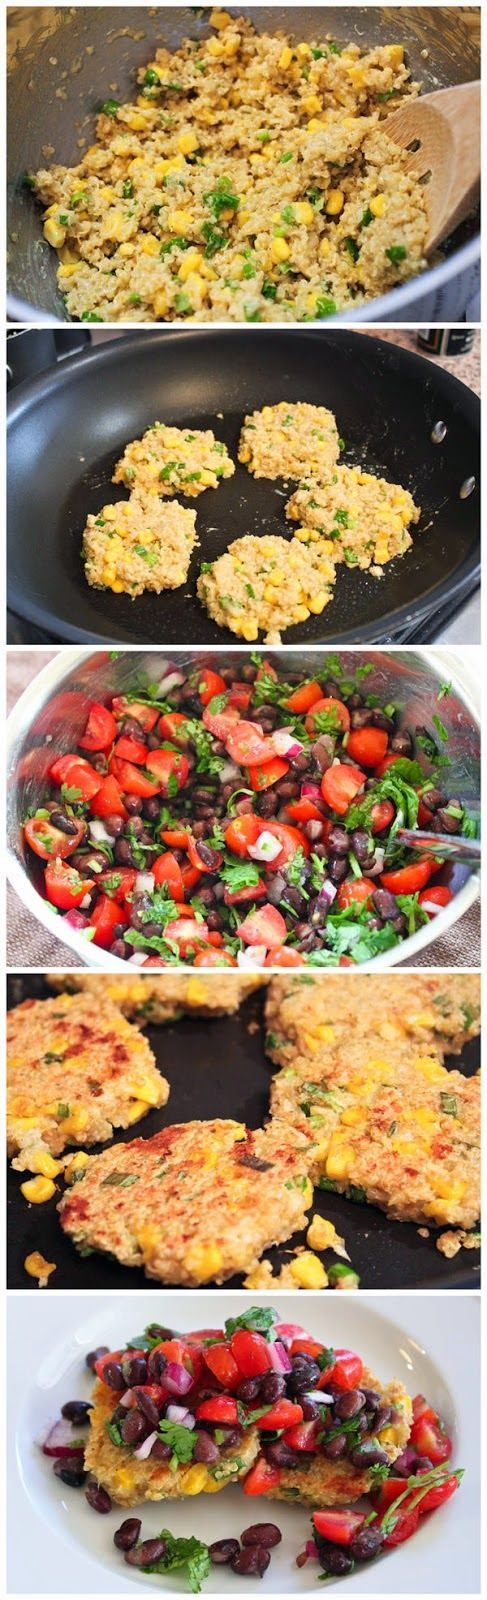 Quinoa & Corn Griddle Cakes With Black Bean Salsa Recipe